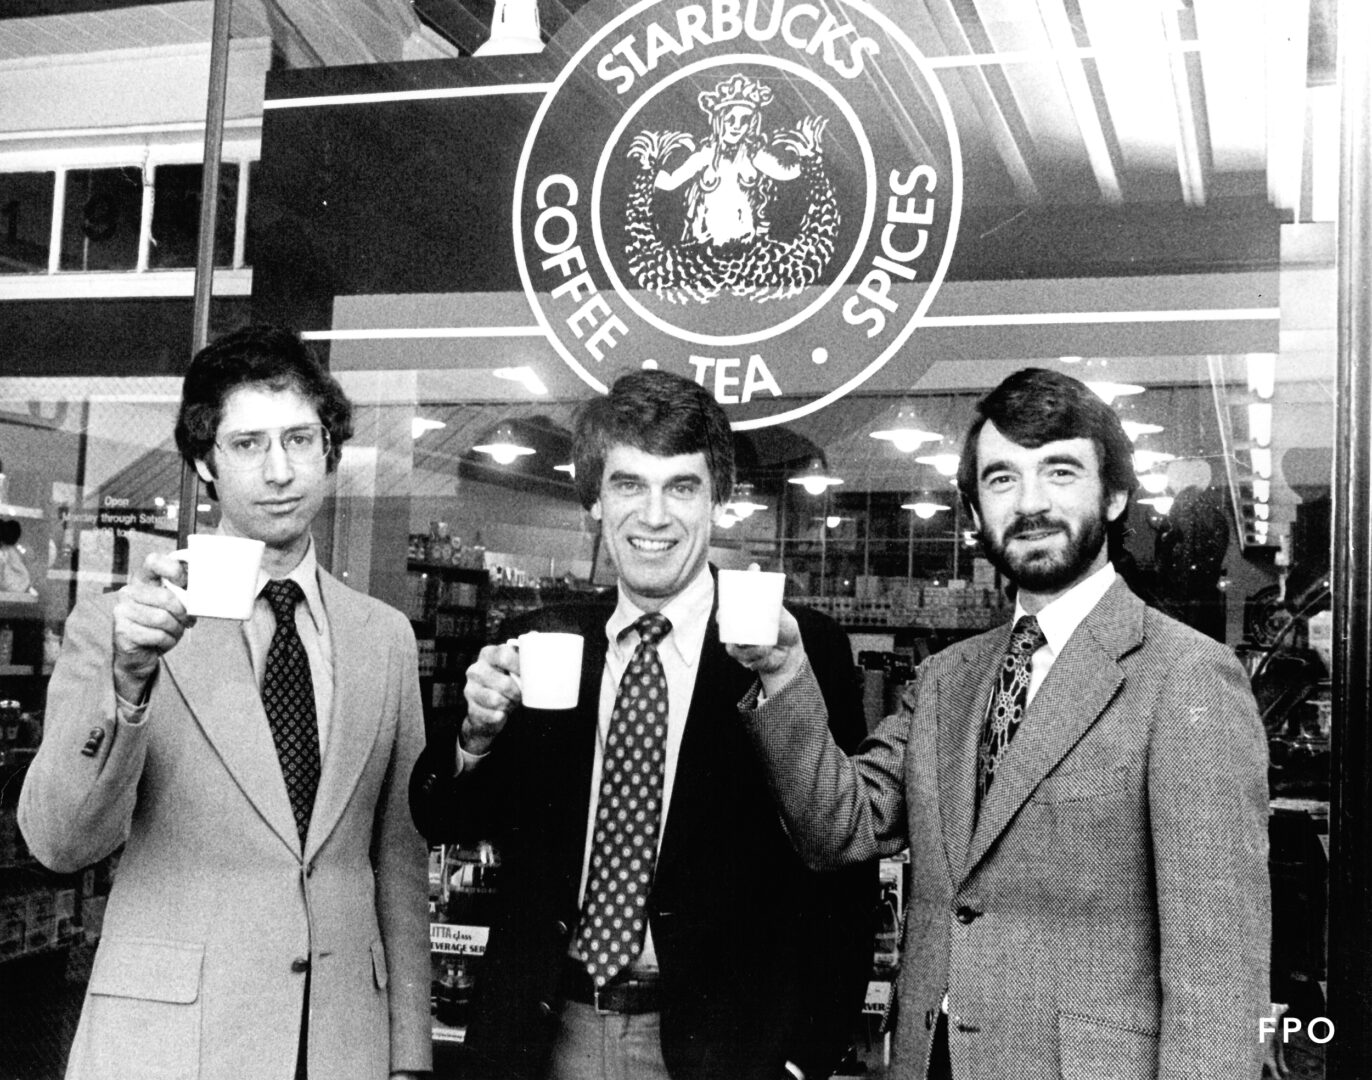 Zev Siegl, Gerald Baldwin and Gordon Bowker